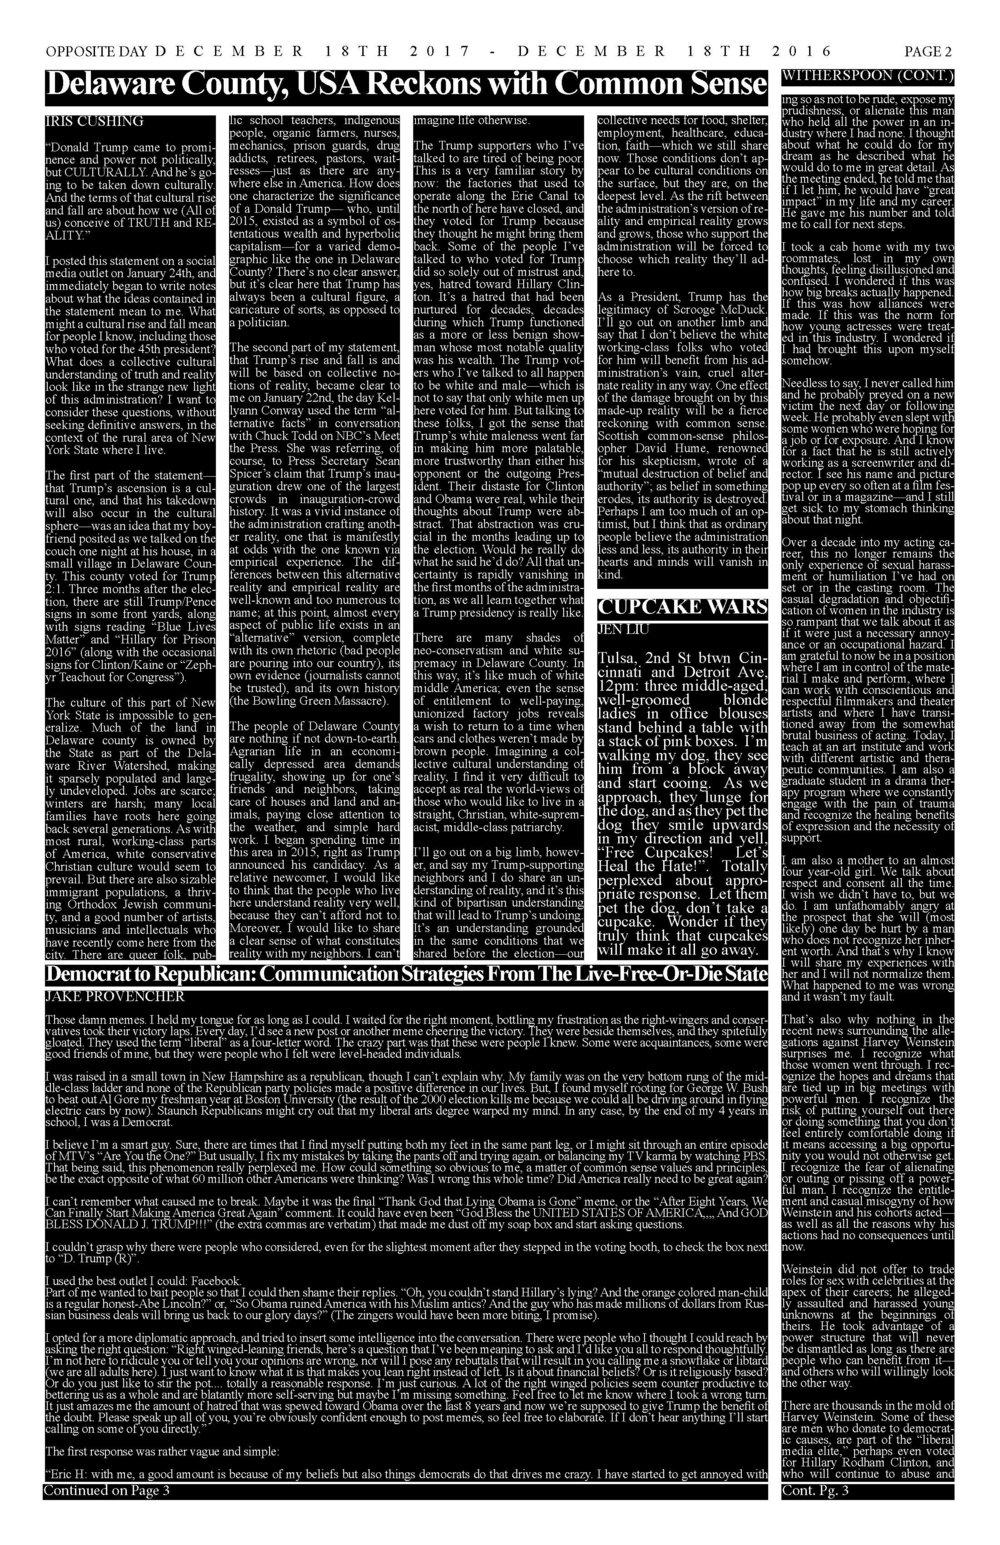 oppositeday_2017_12_08_17x11_final2_Page_2.jpg